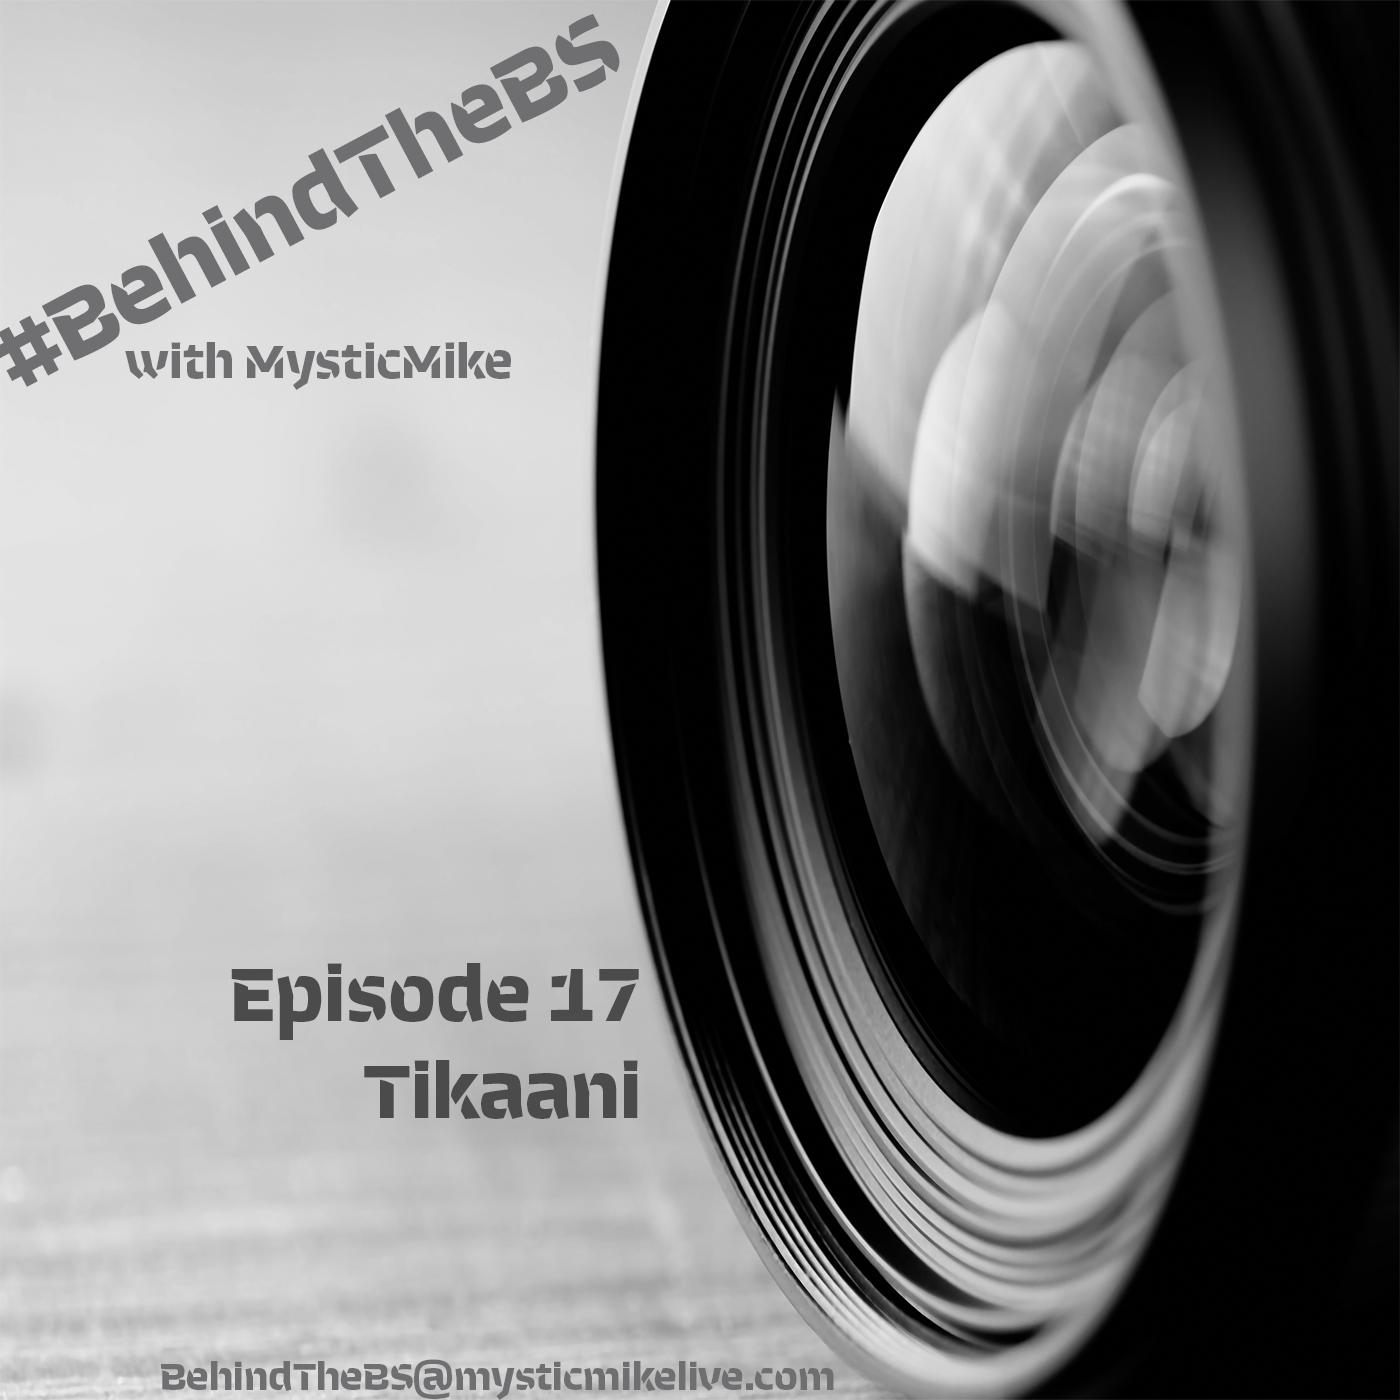 Artwork for #BehindTheBS Episode 17 - Tikaani